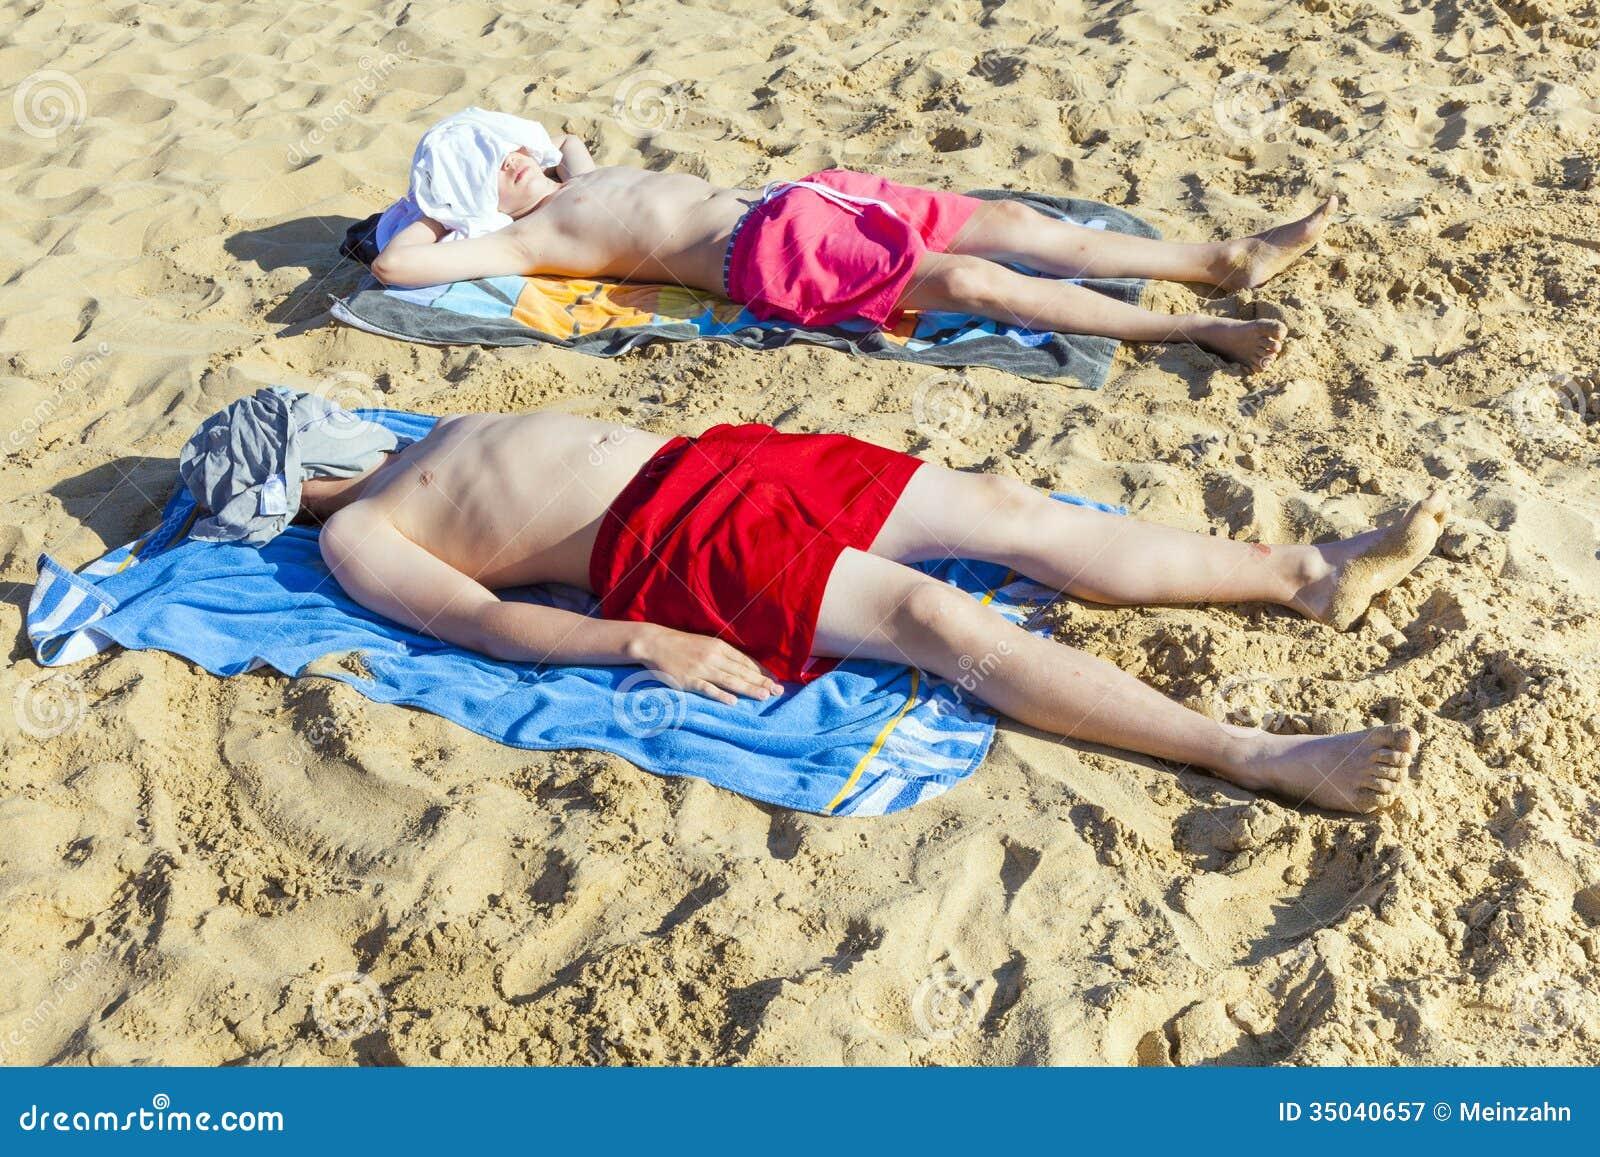 sunbathing naked teen boys